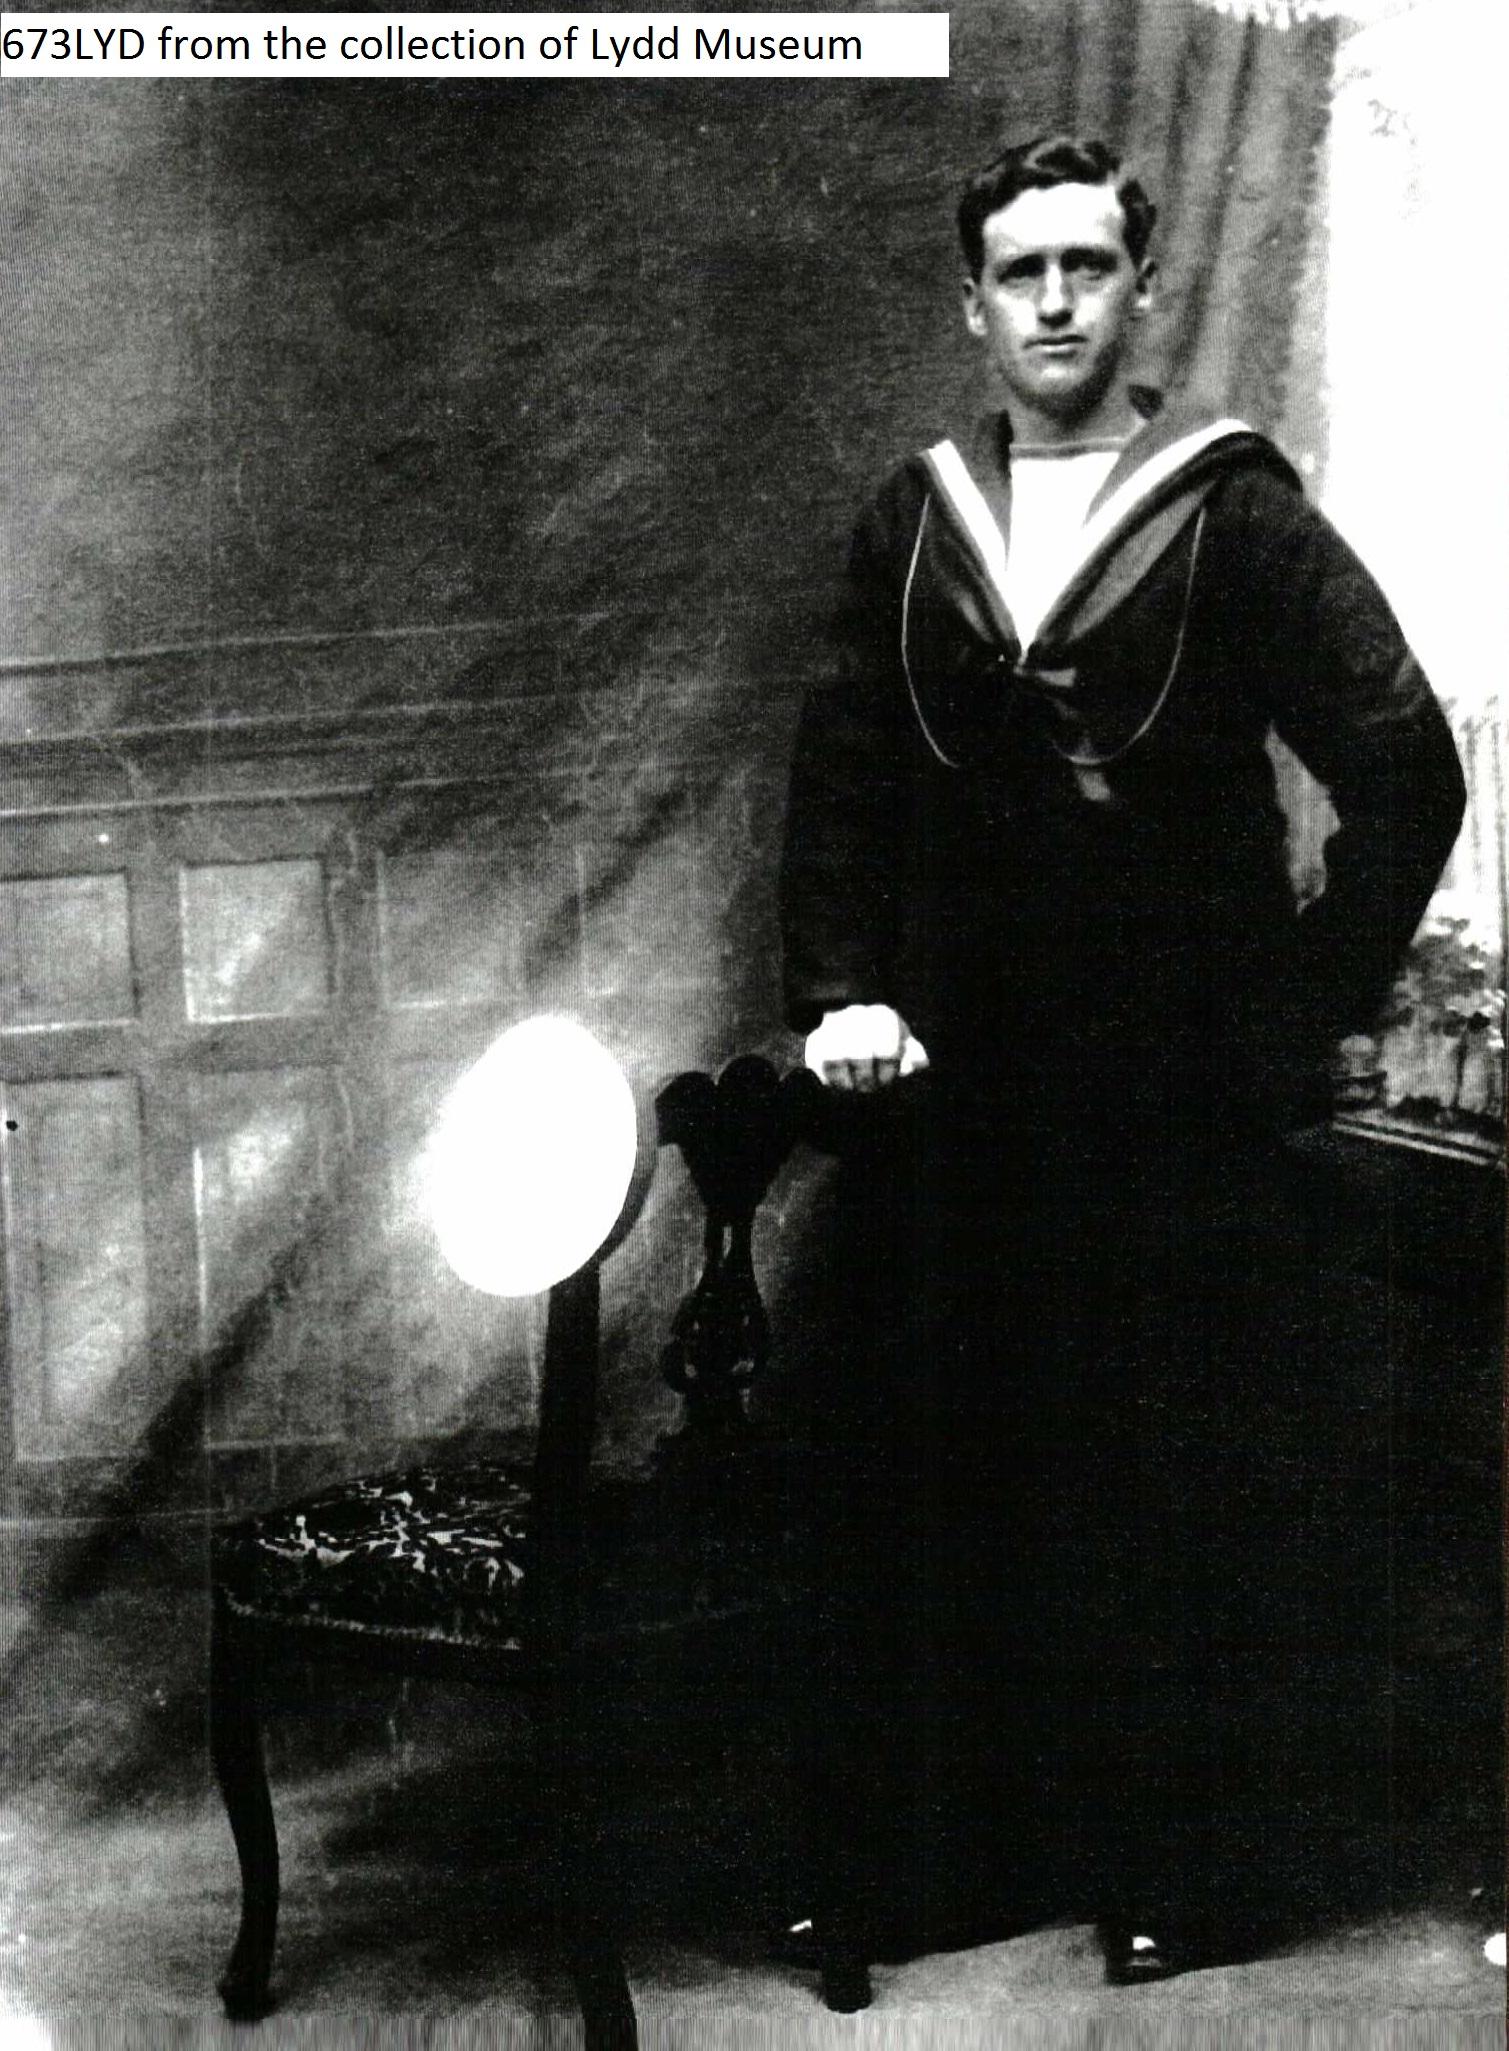 William John Marshall